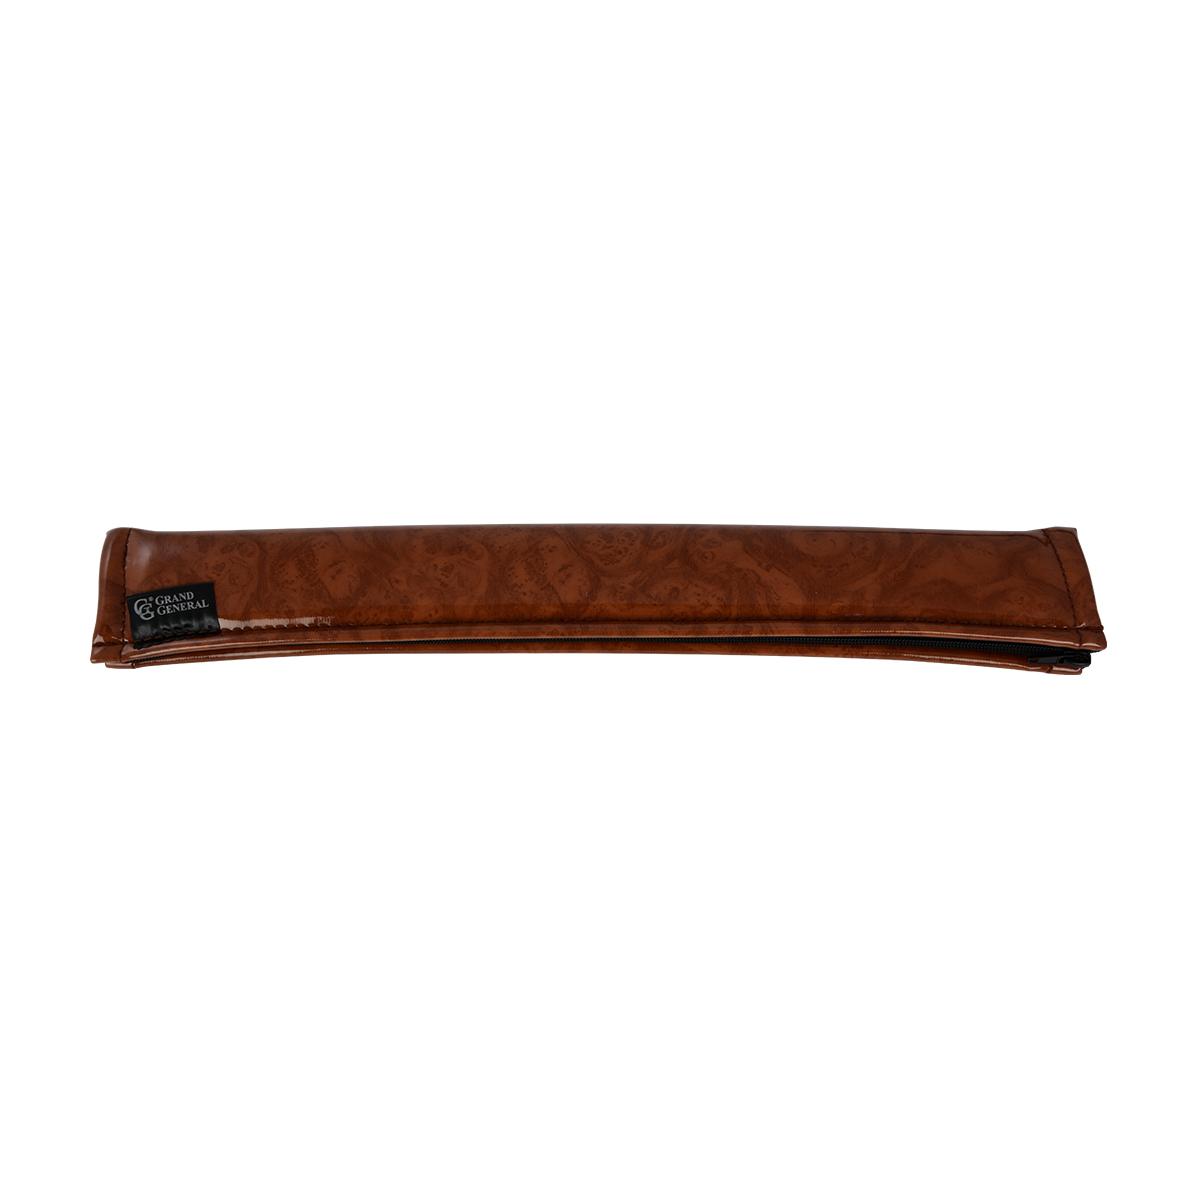 "17"" Dark Wood Gear Shift Stick Cover for Peterbilt Kenworth Freightliner"